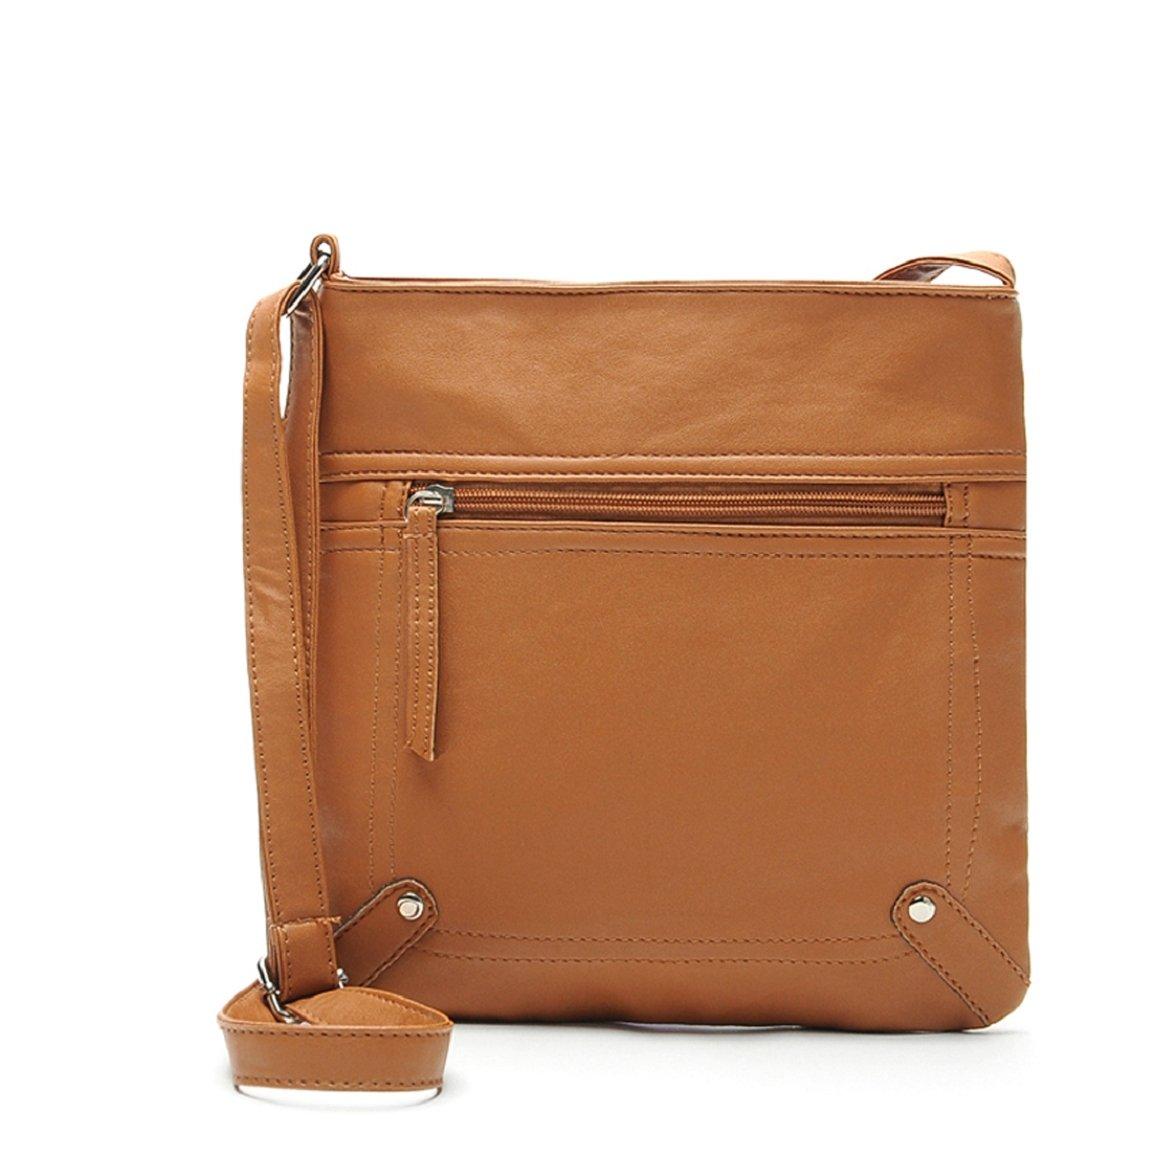 Changeshopping(TM)Fashion Womens Leather Satchel Cross Body Shoulder Messenger Bag changeshopping325